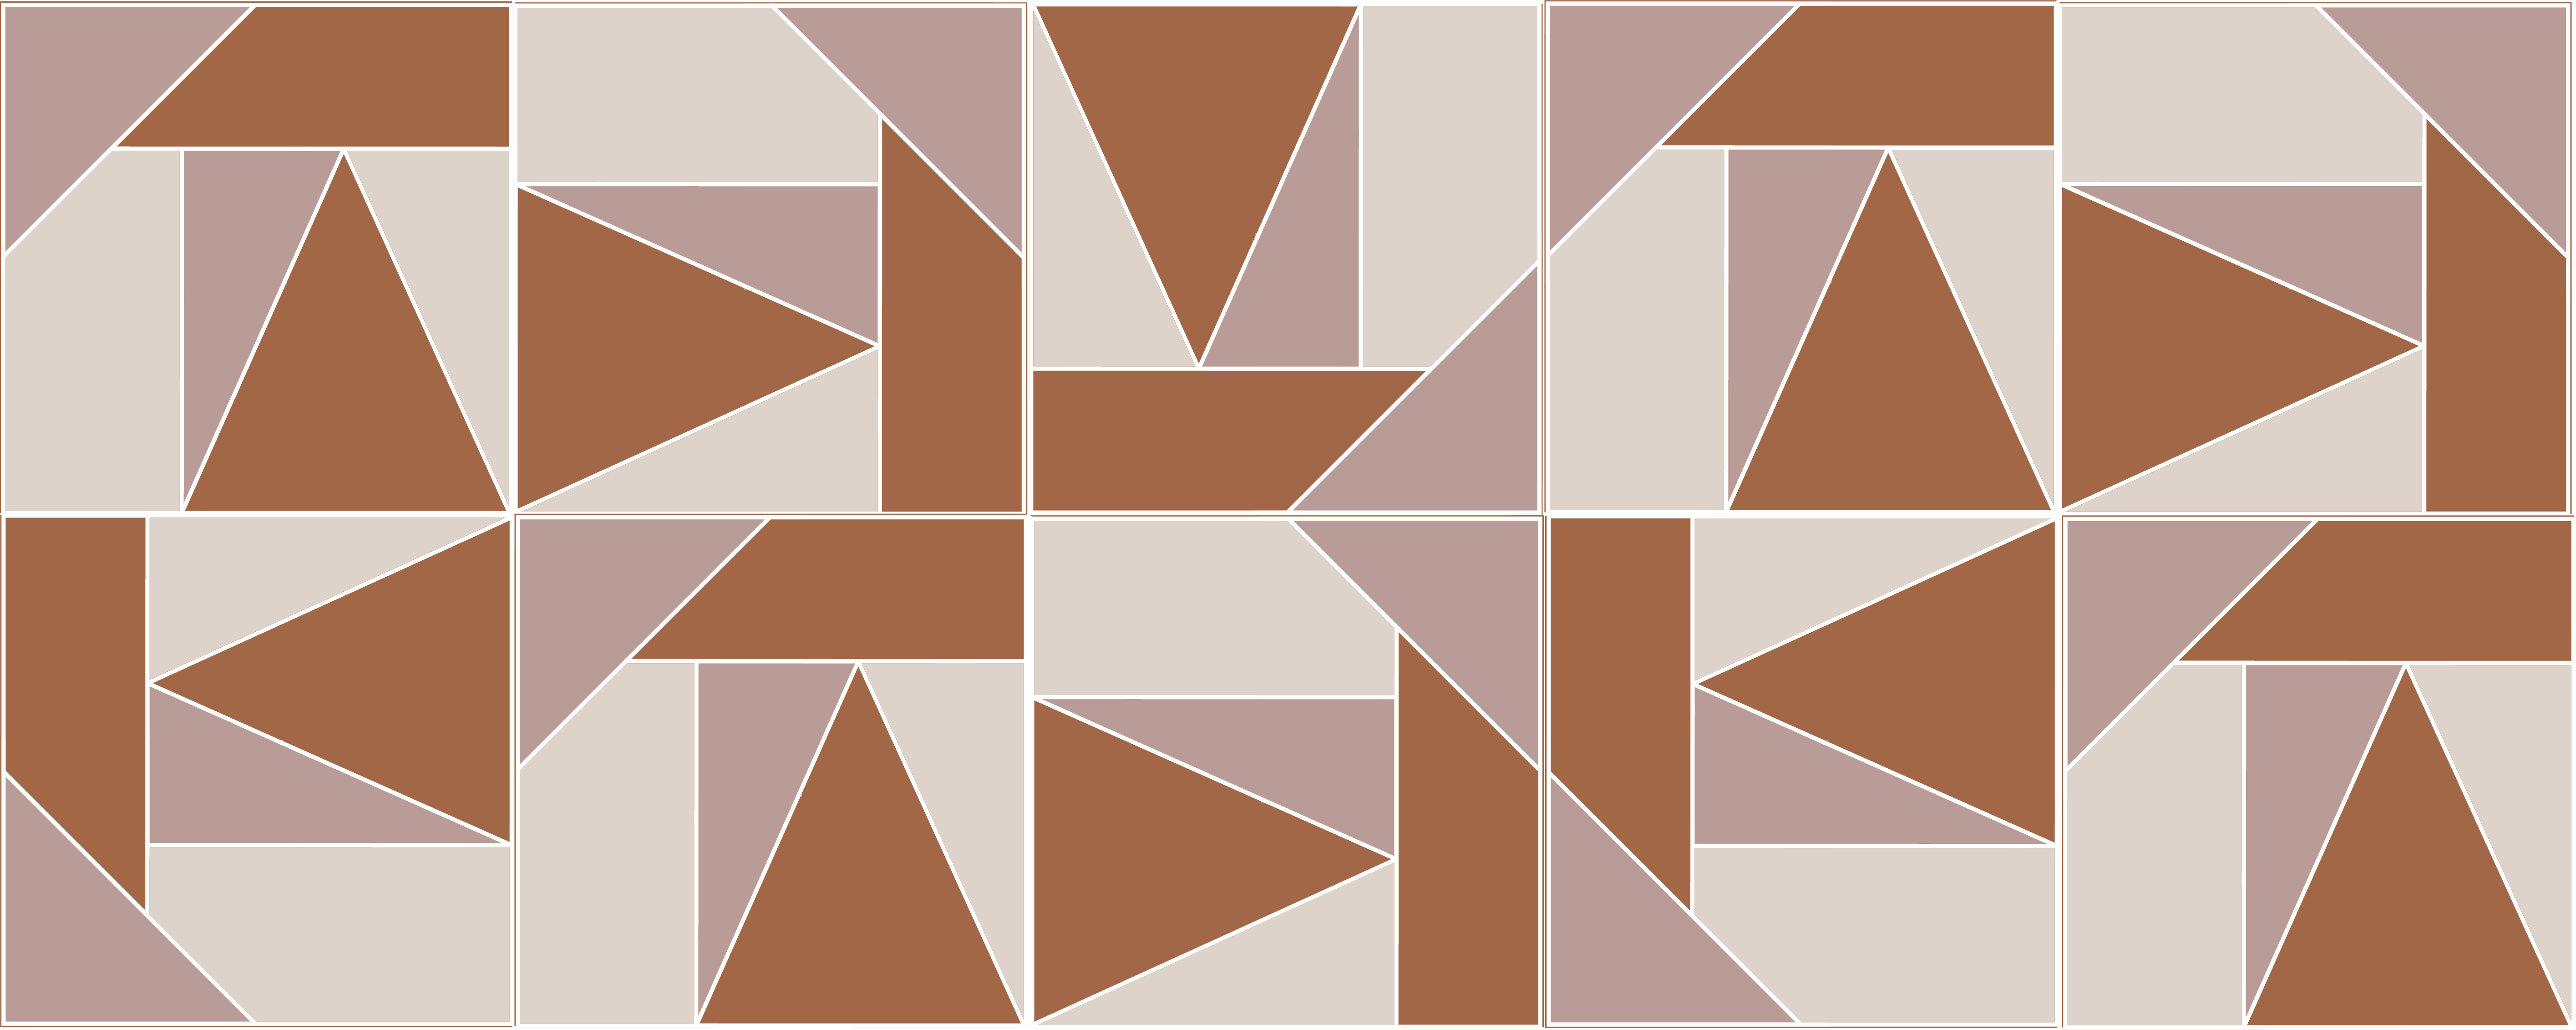 Random Triangles